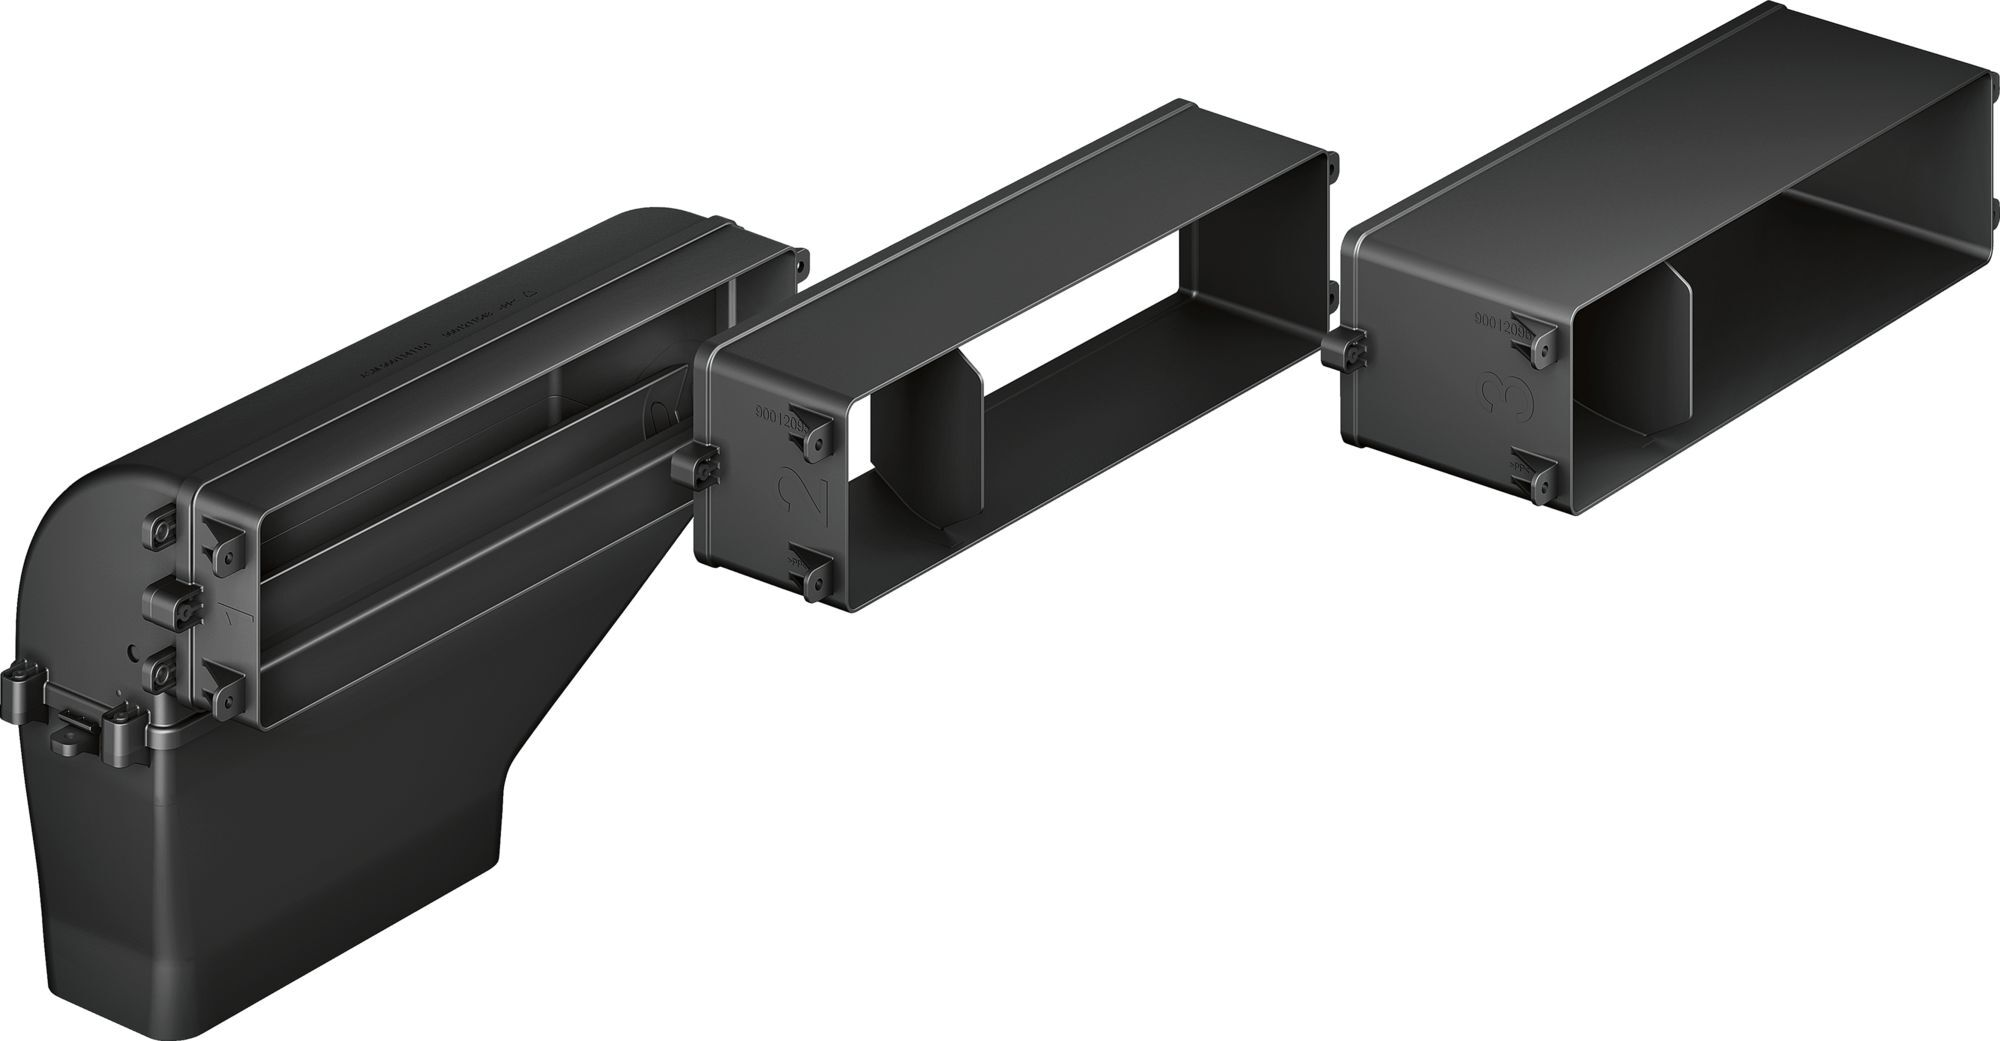 Siemens HZ381401 Ducting Kit